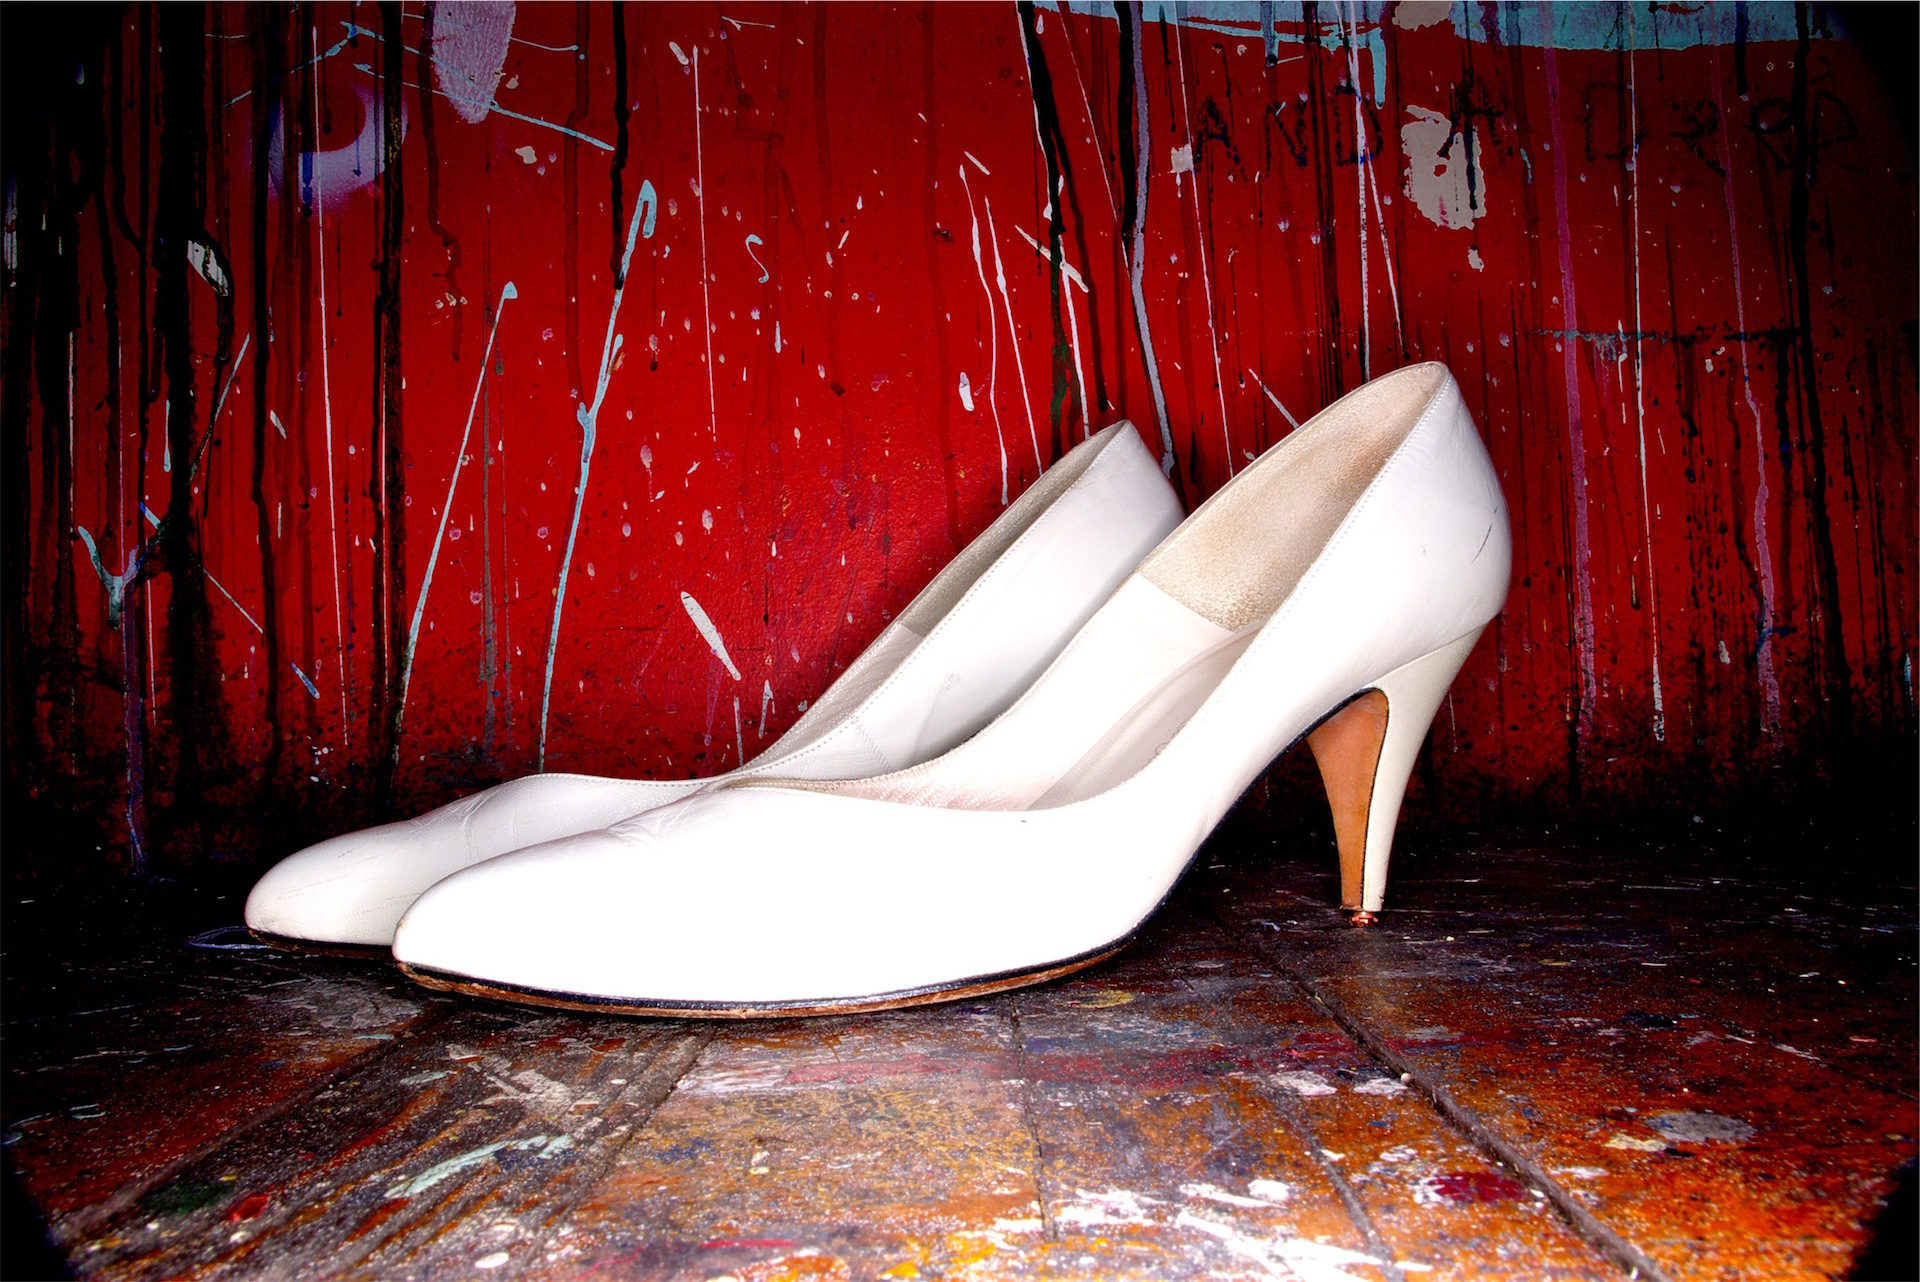 sapatos, sapatos de salto altos, pintura, manchas, Branco - Papéis de parede HD - Professor-falken.com